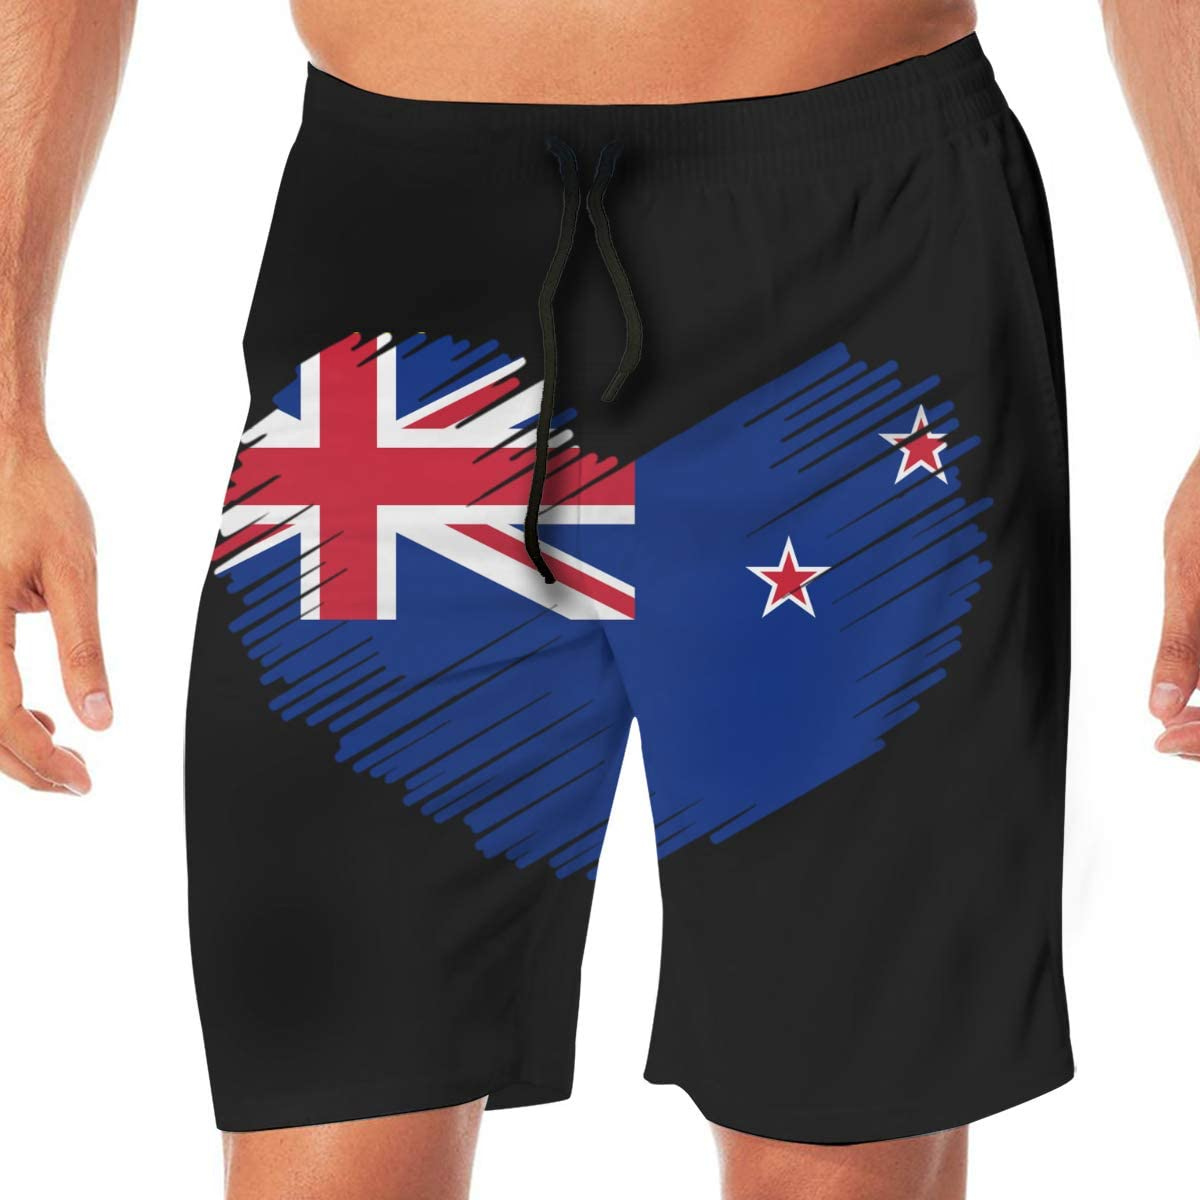 Mens Swim Shorts New Zealand Flag in Heart Shape Summer Vacation Beach Board Short with Pocket